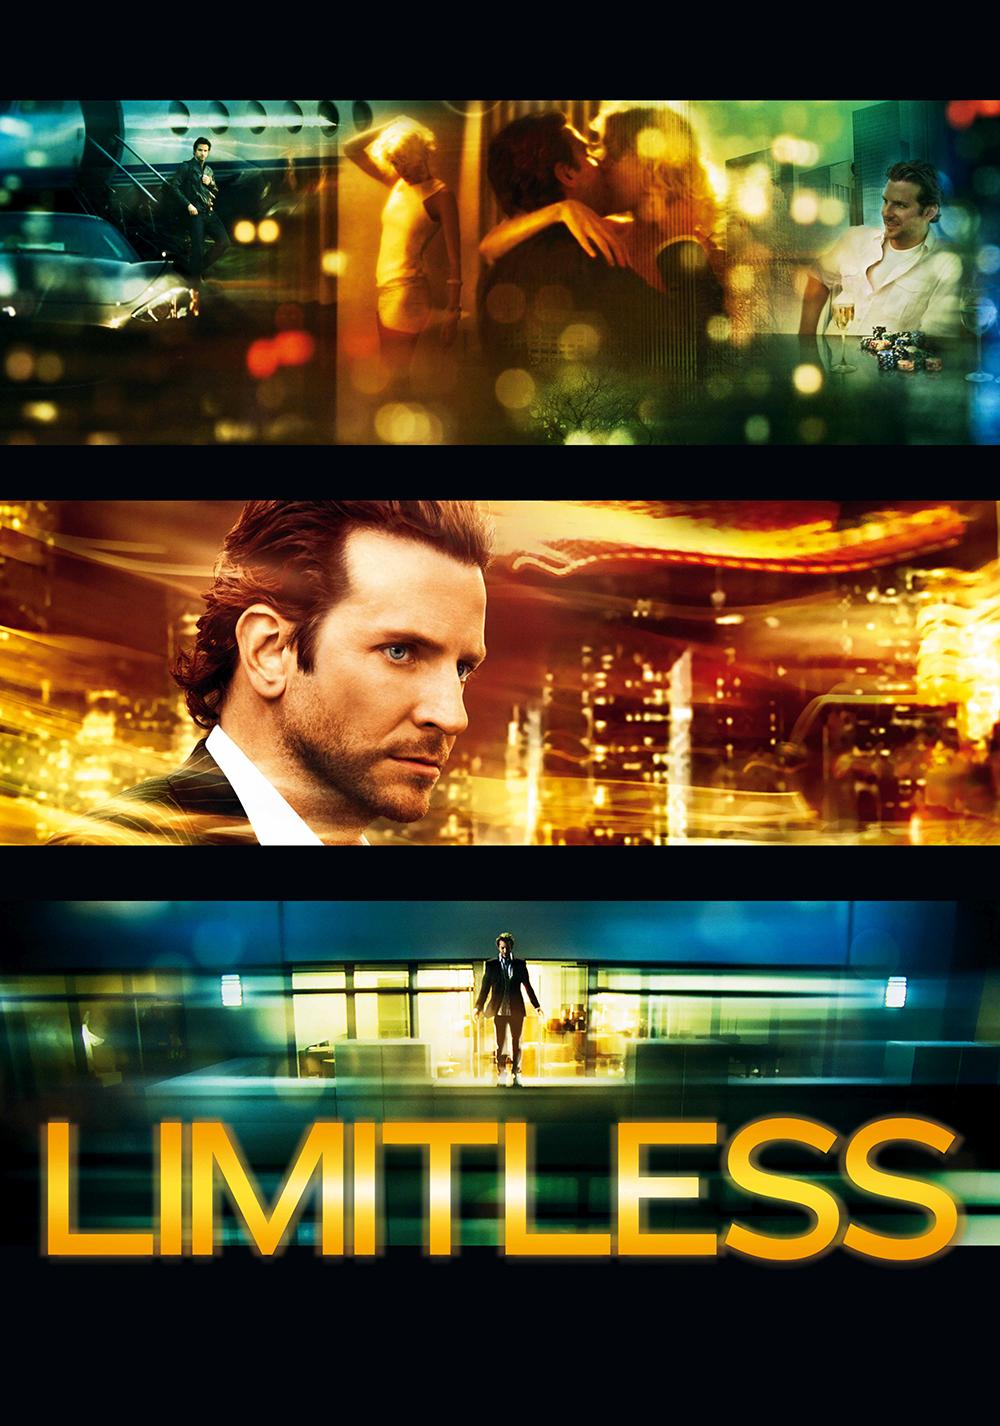 Limitless   Movie fana... Bradley Cooper Movies